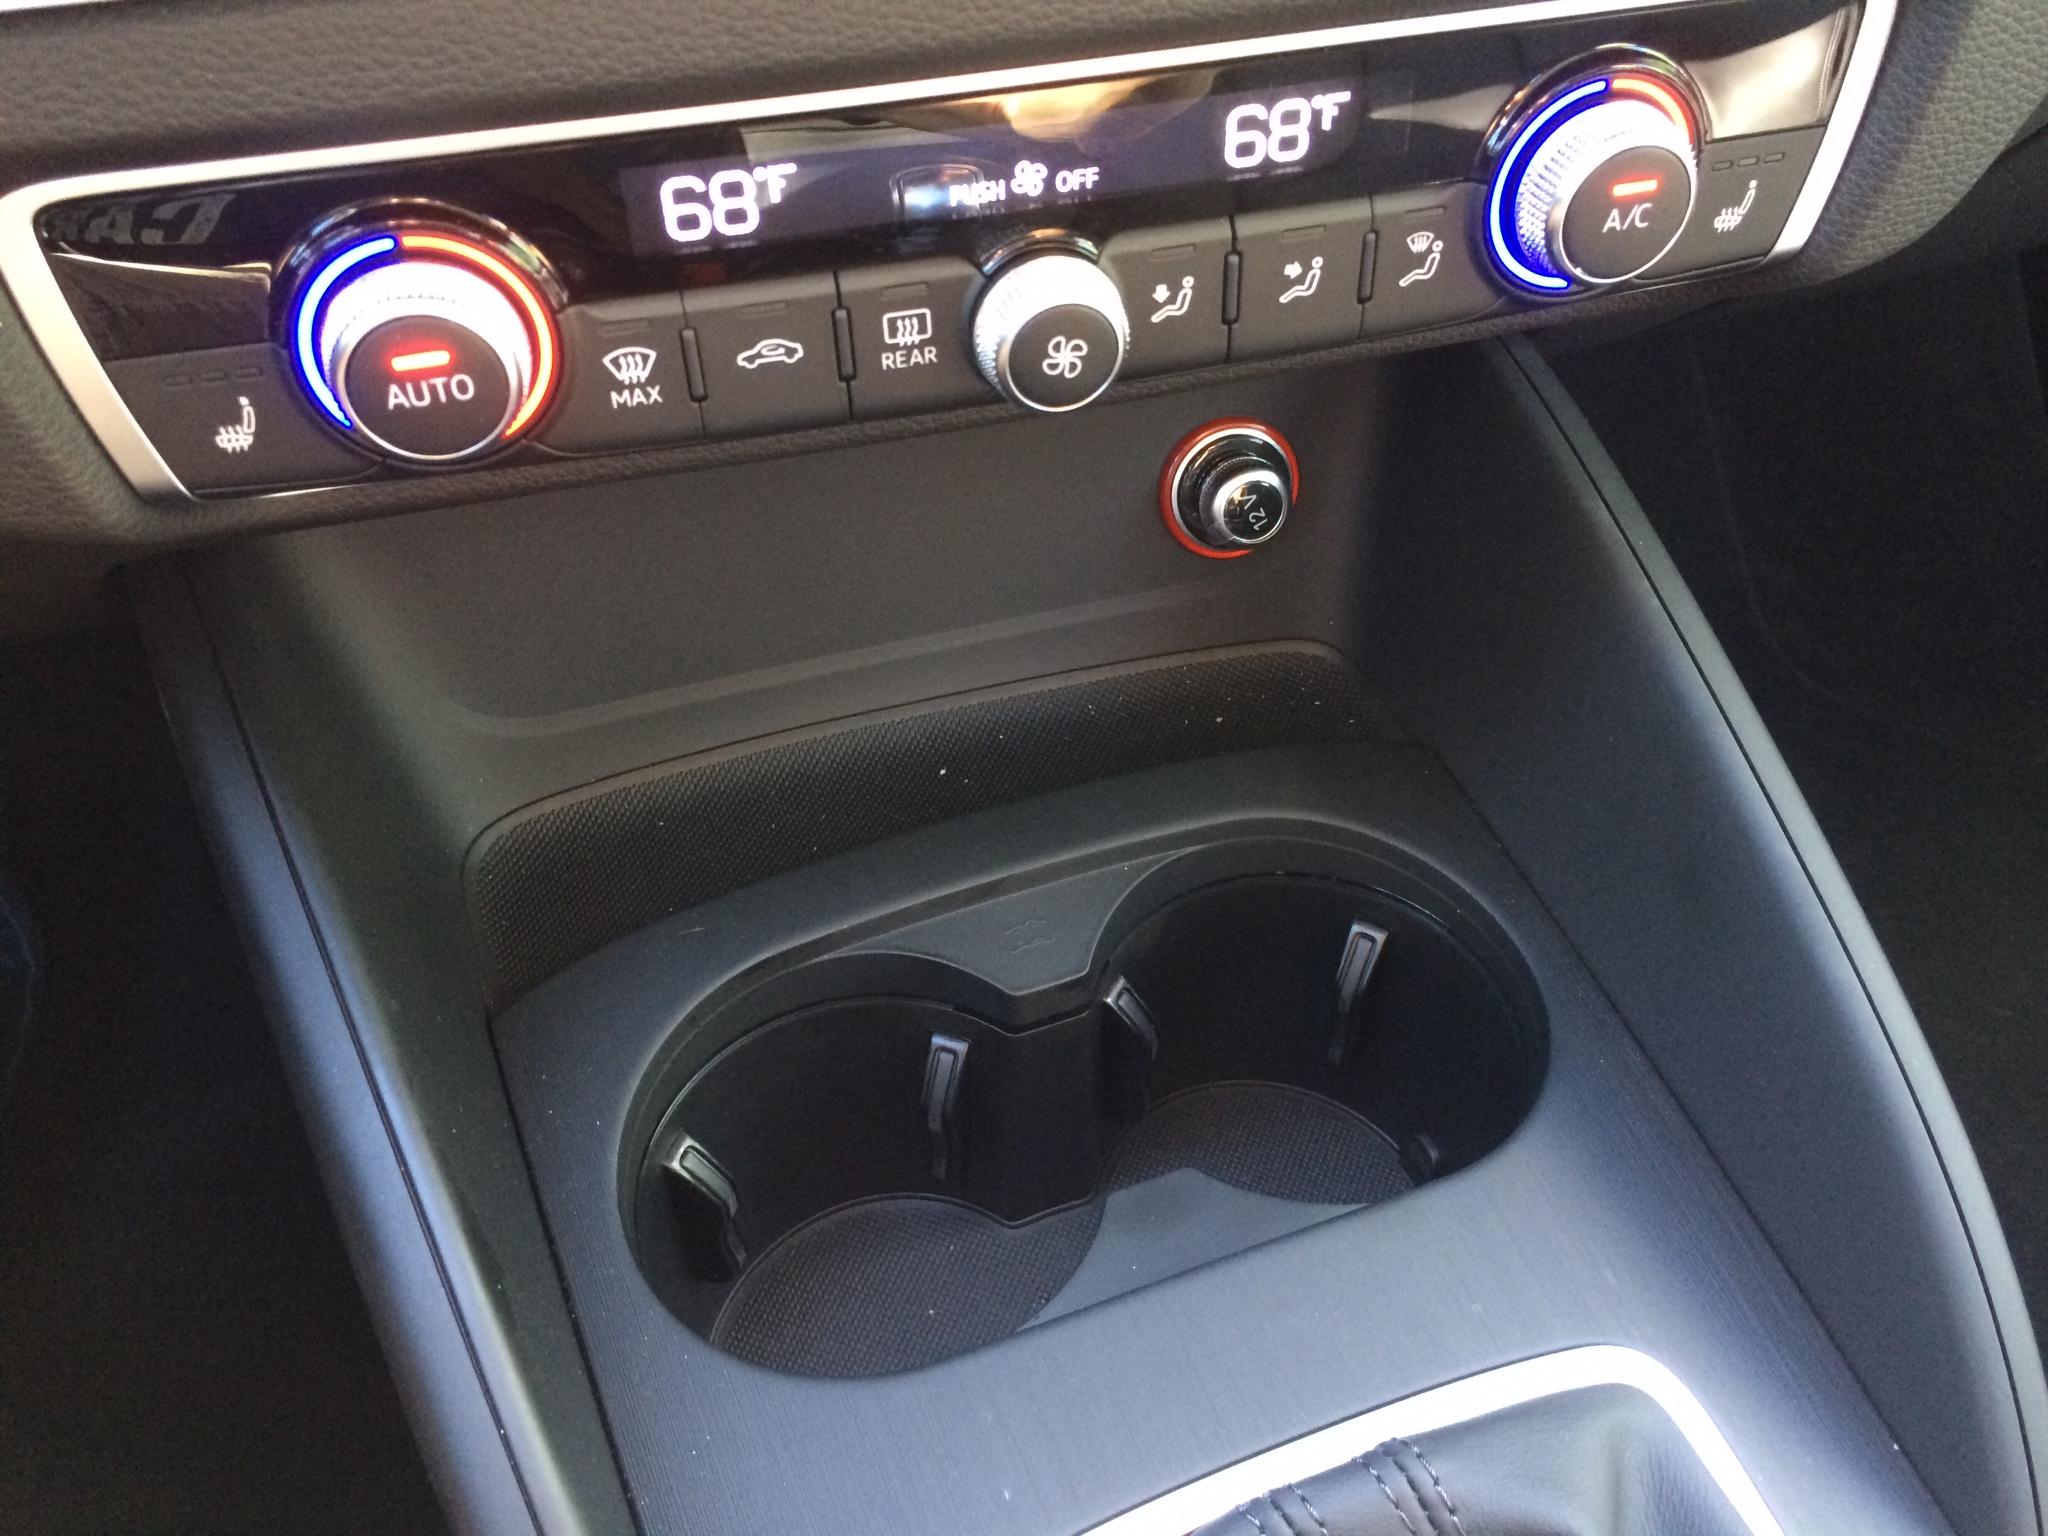 Audi  Todd Biancos ACarIsNotARefrigeratorcom Blog